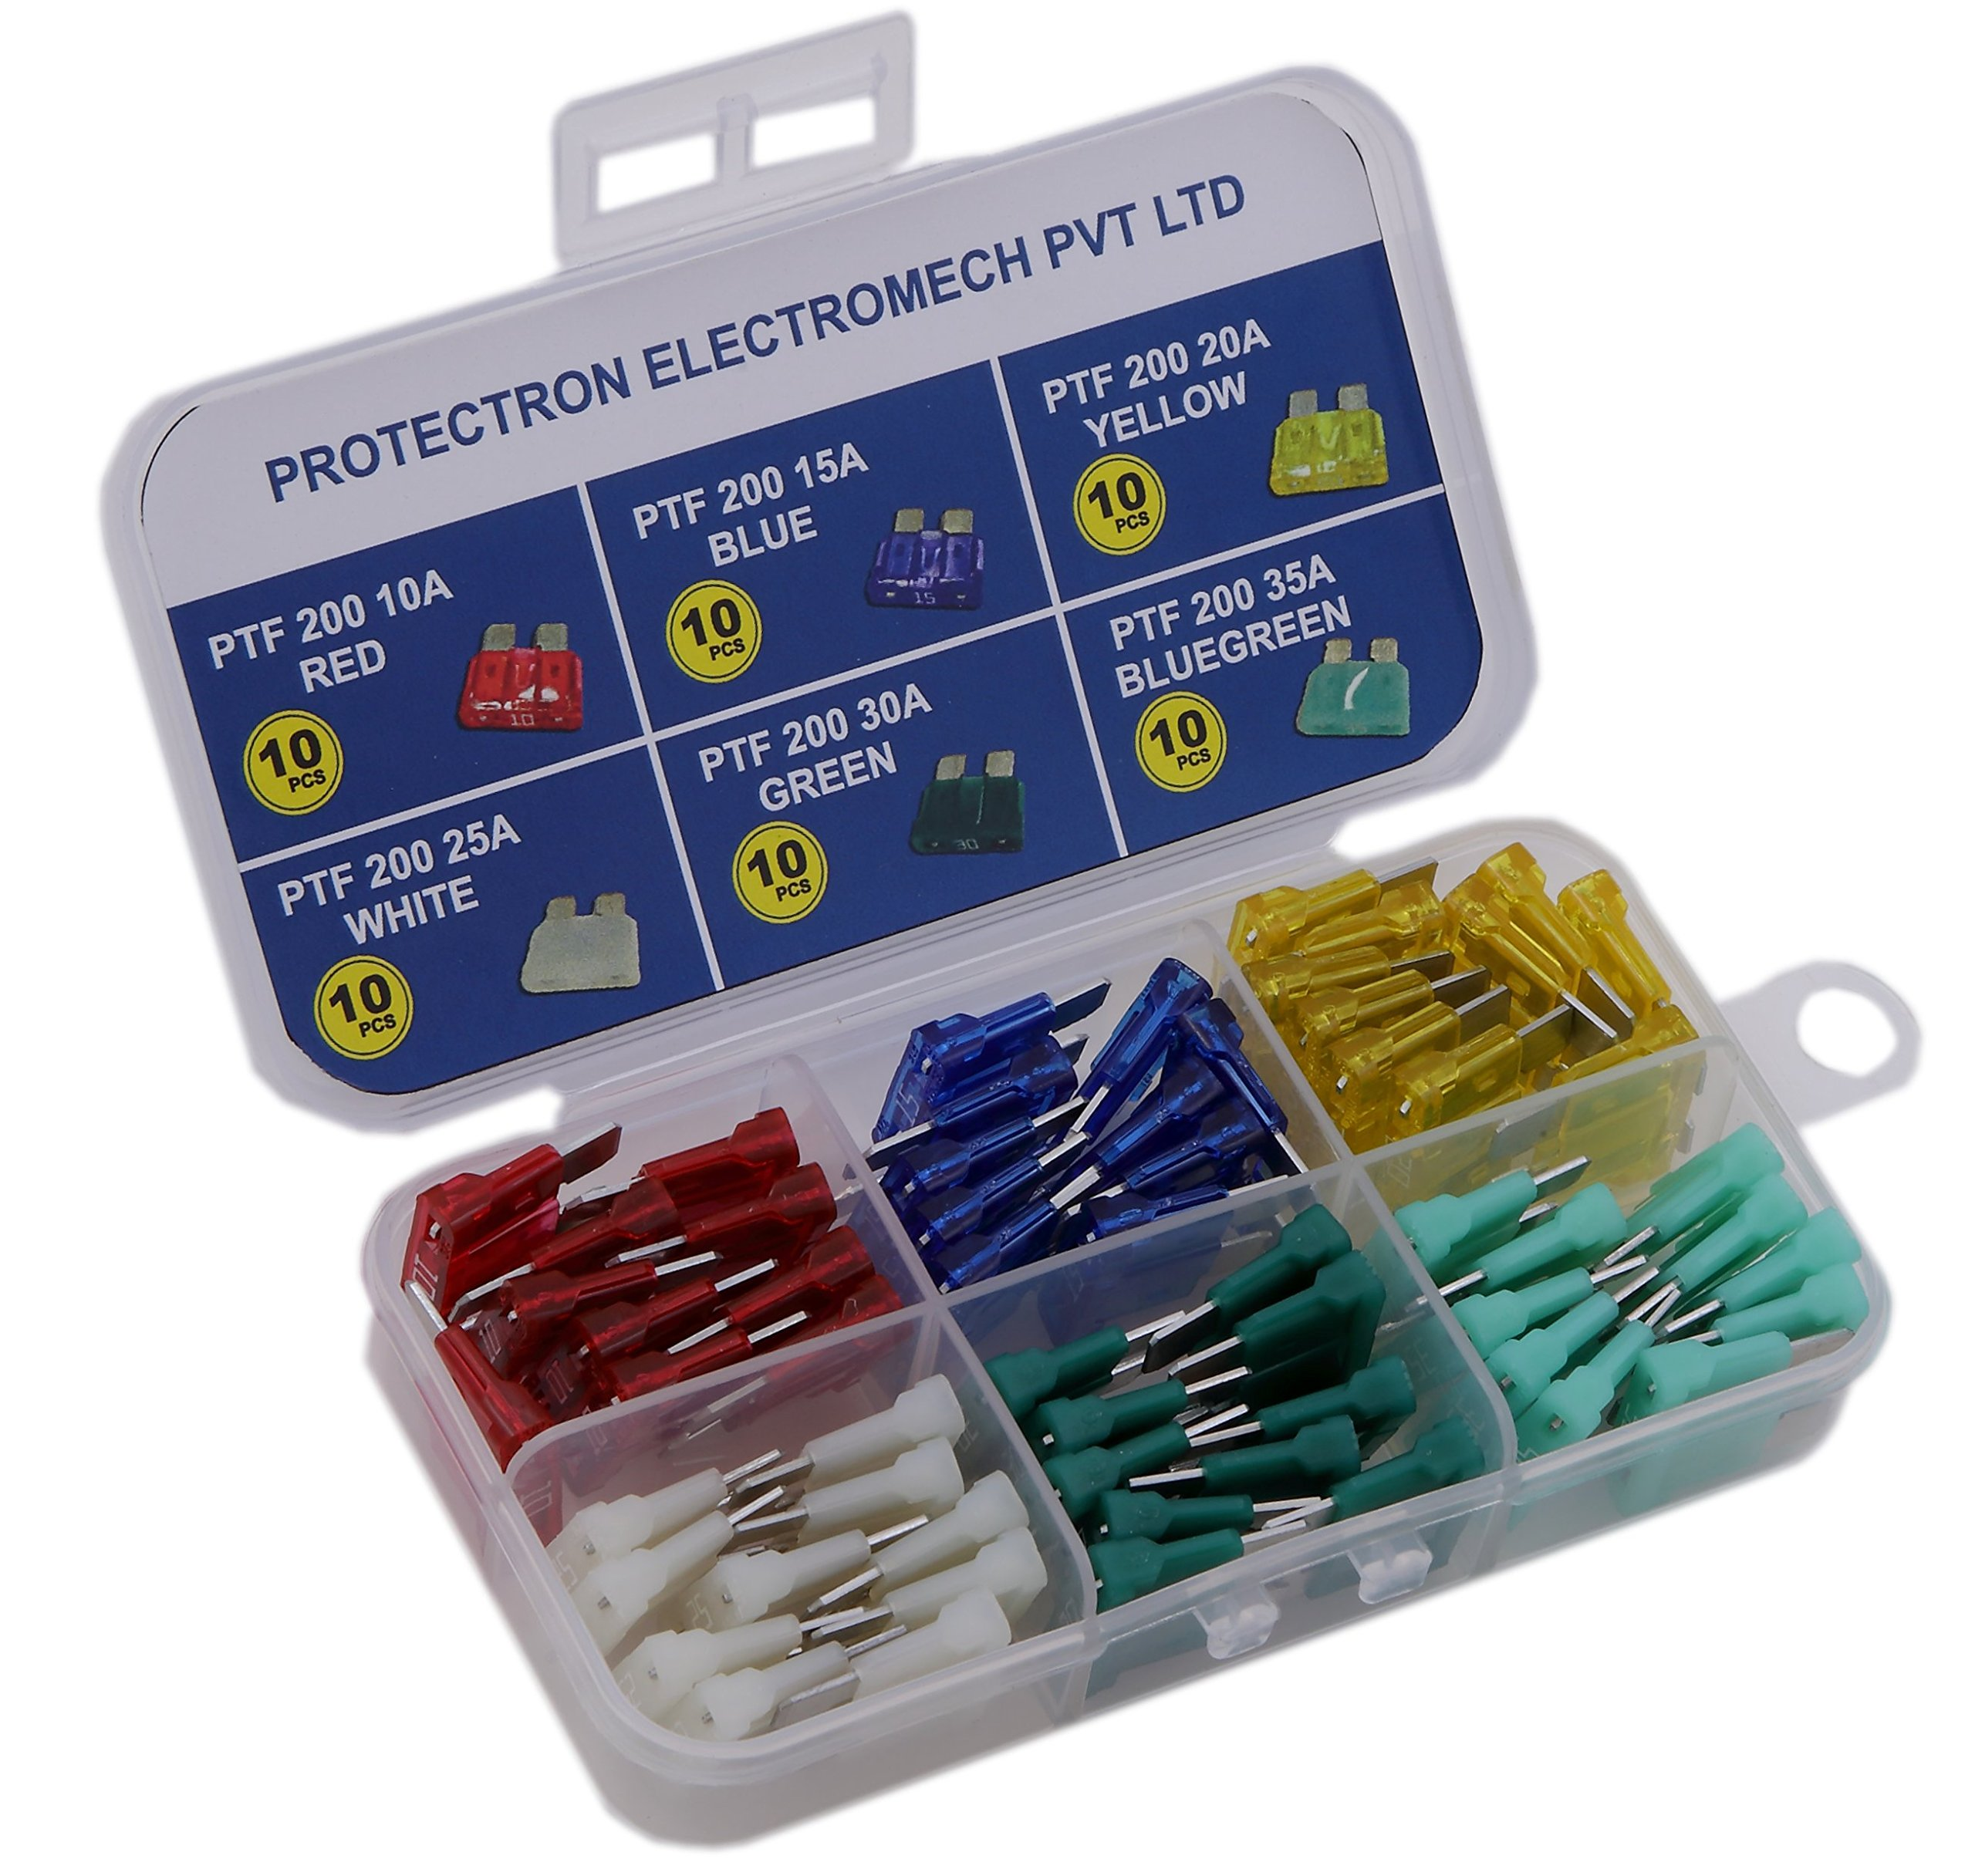 PROTECTRON 60pc Assorted MIDI BLADE (ATO/ATC) Auto Car standard Fuse kit- 10A, 15A, 20A, 25A, 30A, 35A product image